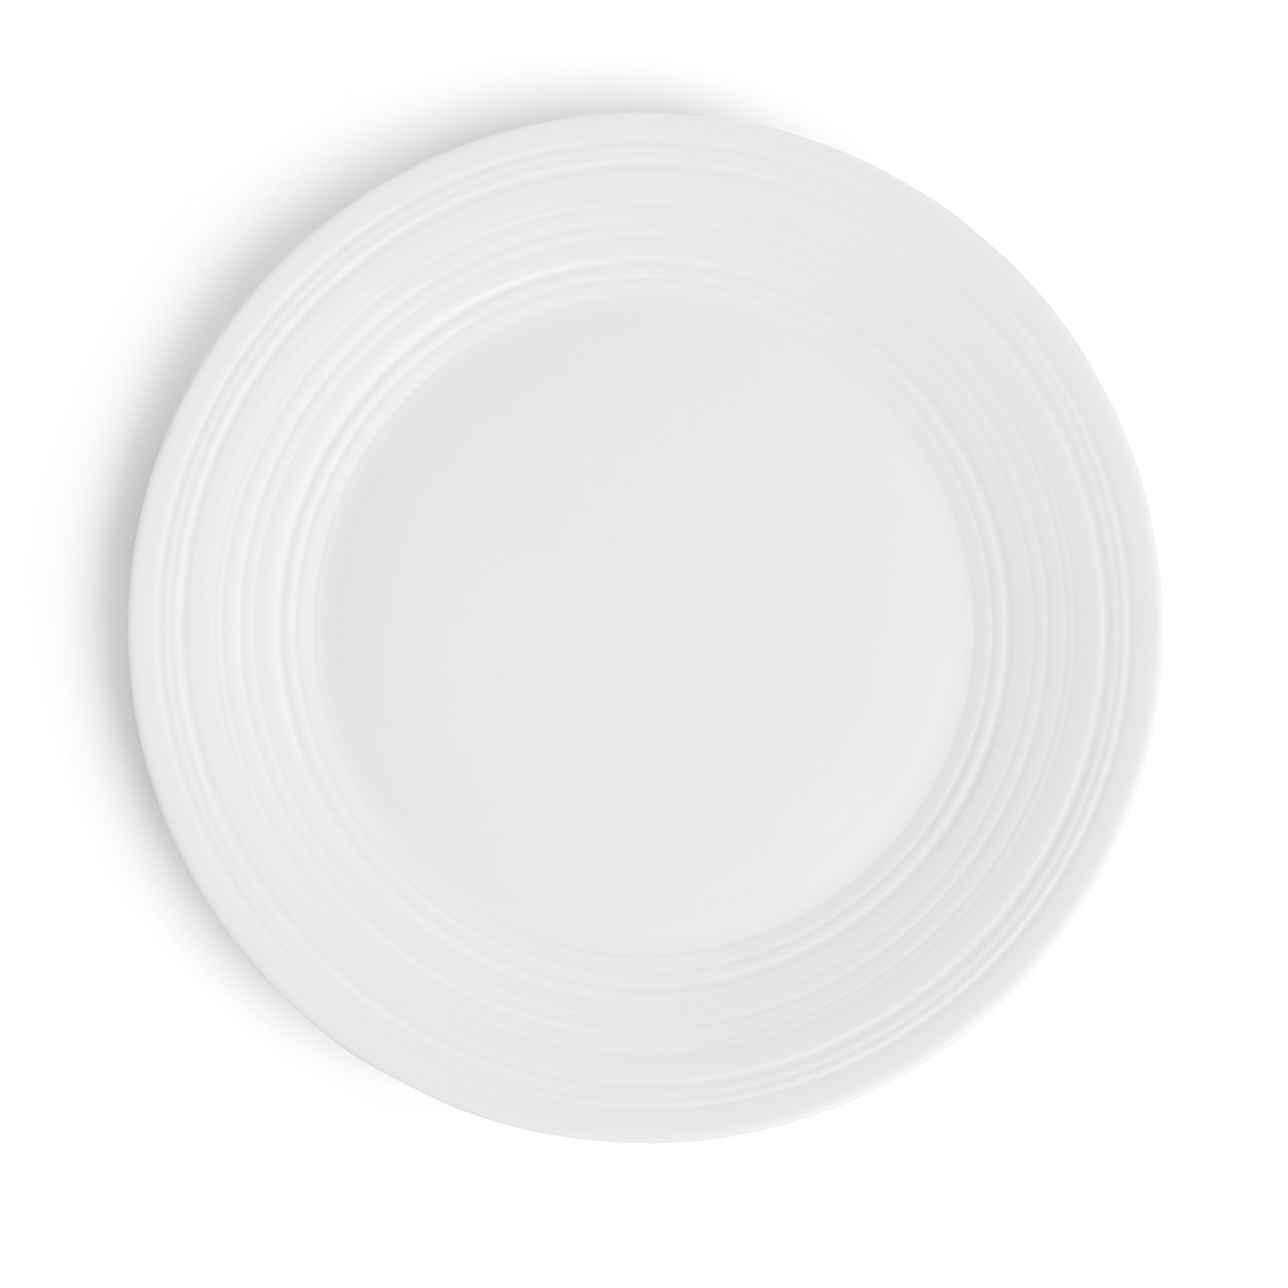 Jasper Conran Strata Dinner Plate 27cm